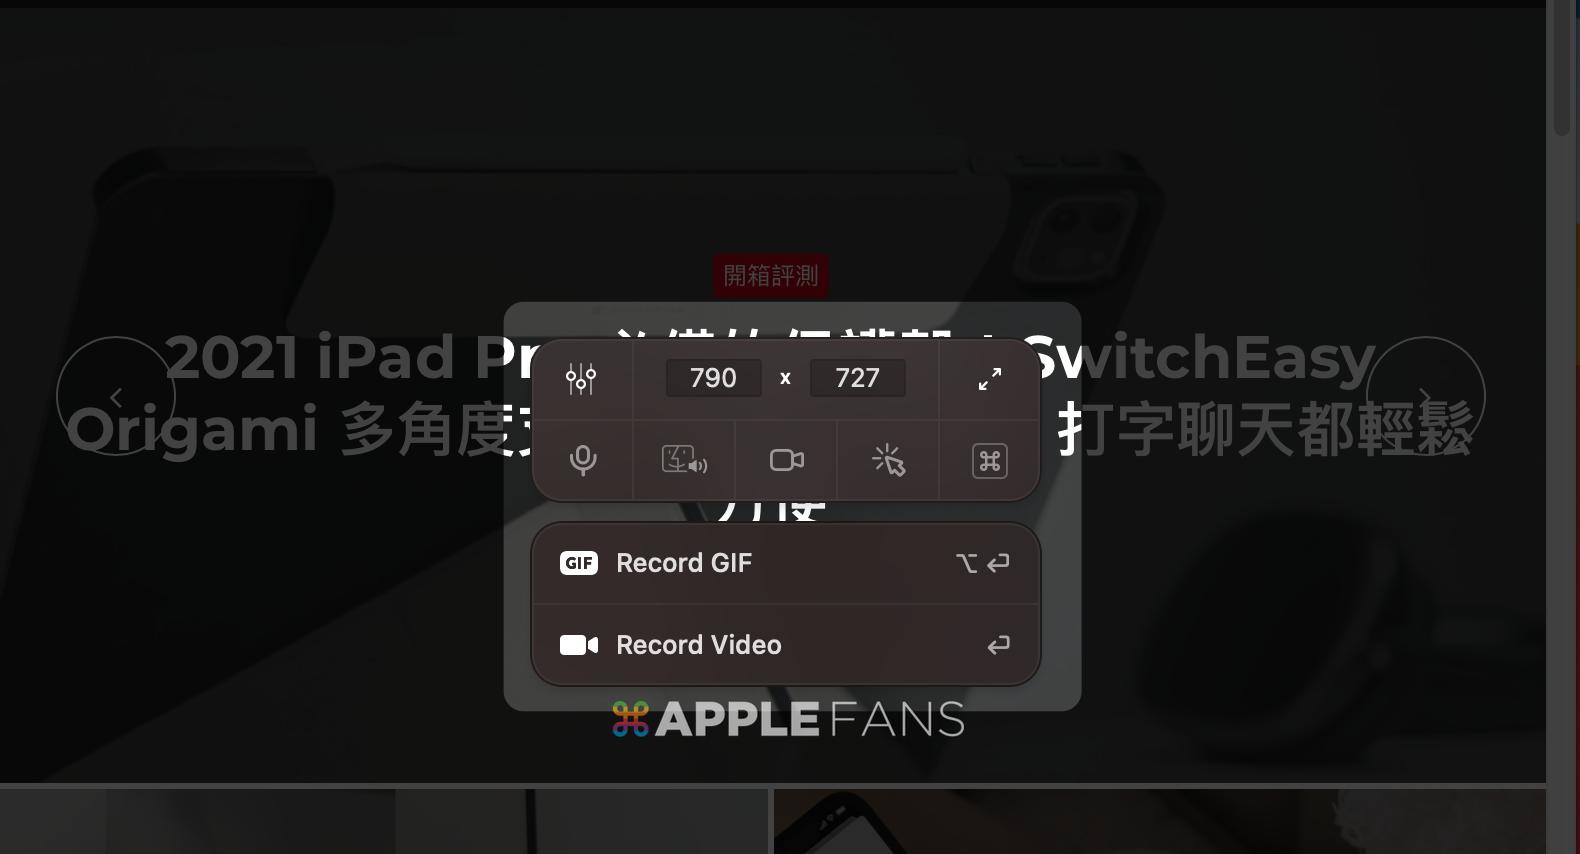 M1 Mac 截圖軟體 推薦 - CleanShot X